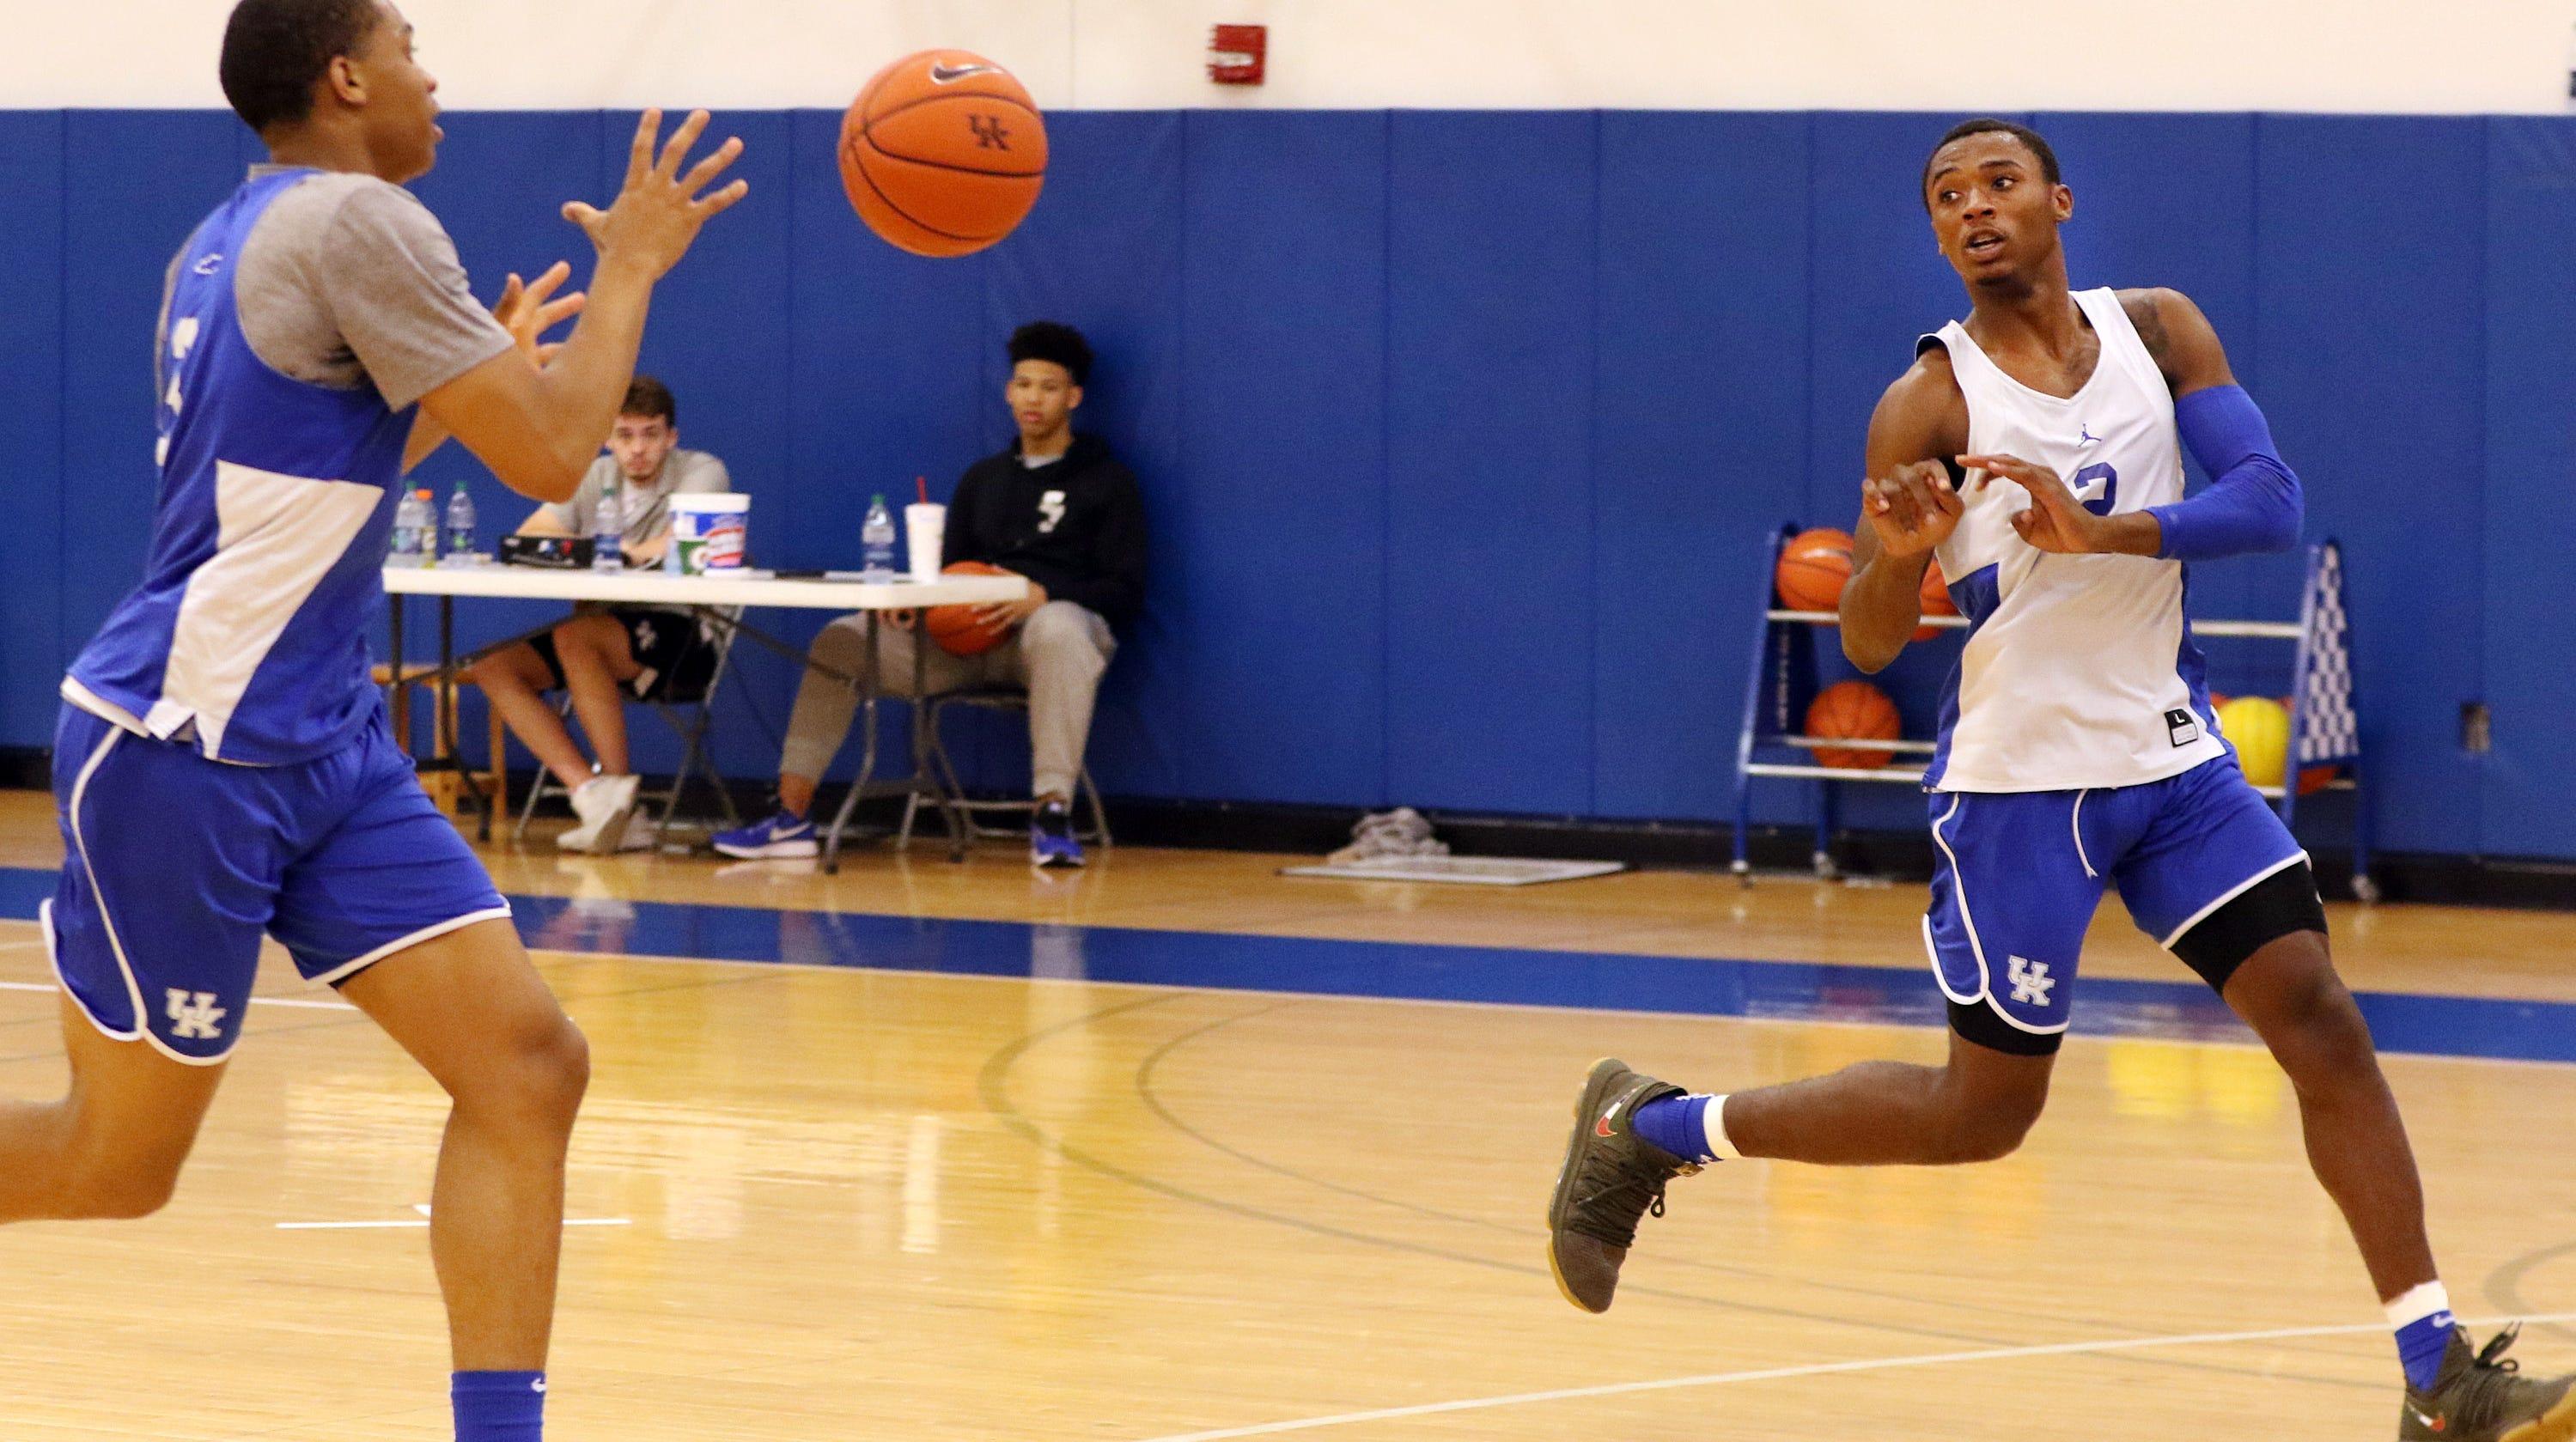 Kentucky Basketball Announces Tv Schedule Game Times And: Kentucky Basketball Bahamas: Schedule, Watch, Listen, Stream